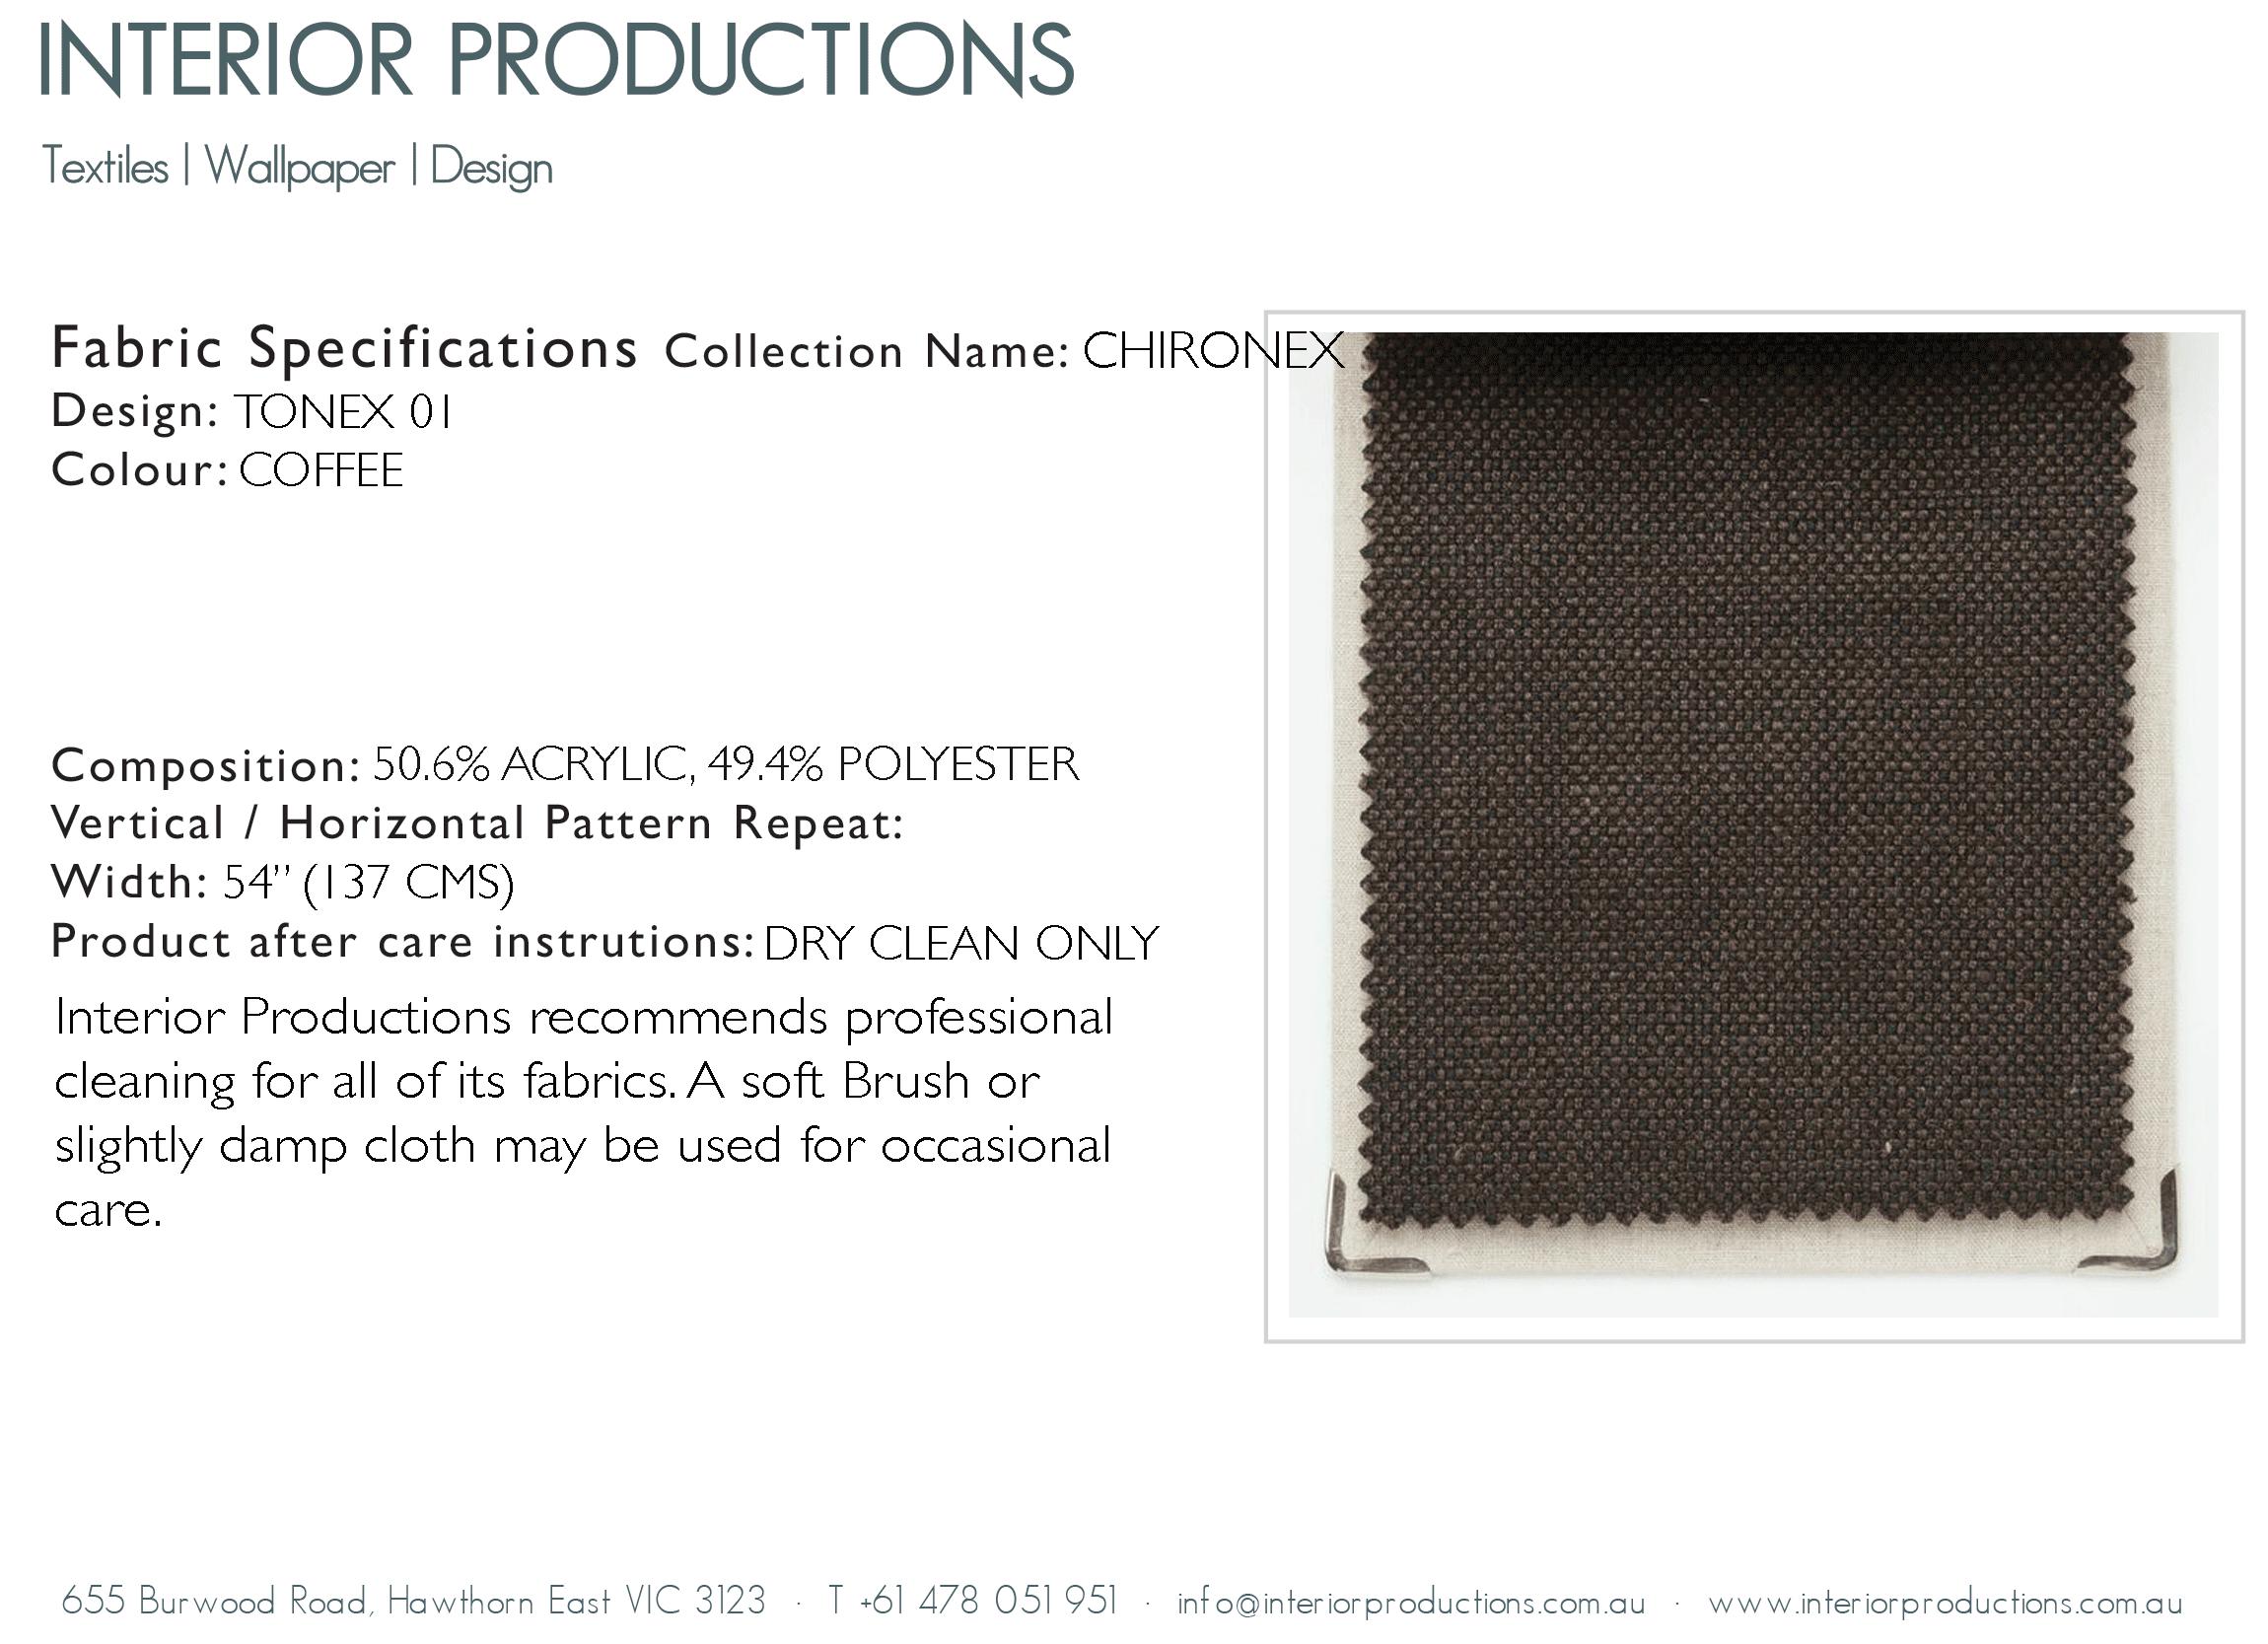 interior_productions_TONEX-01---COFFEE